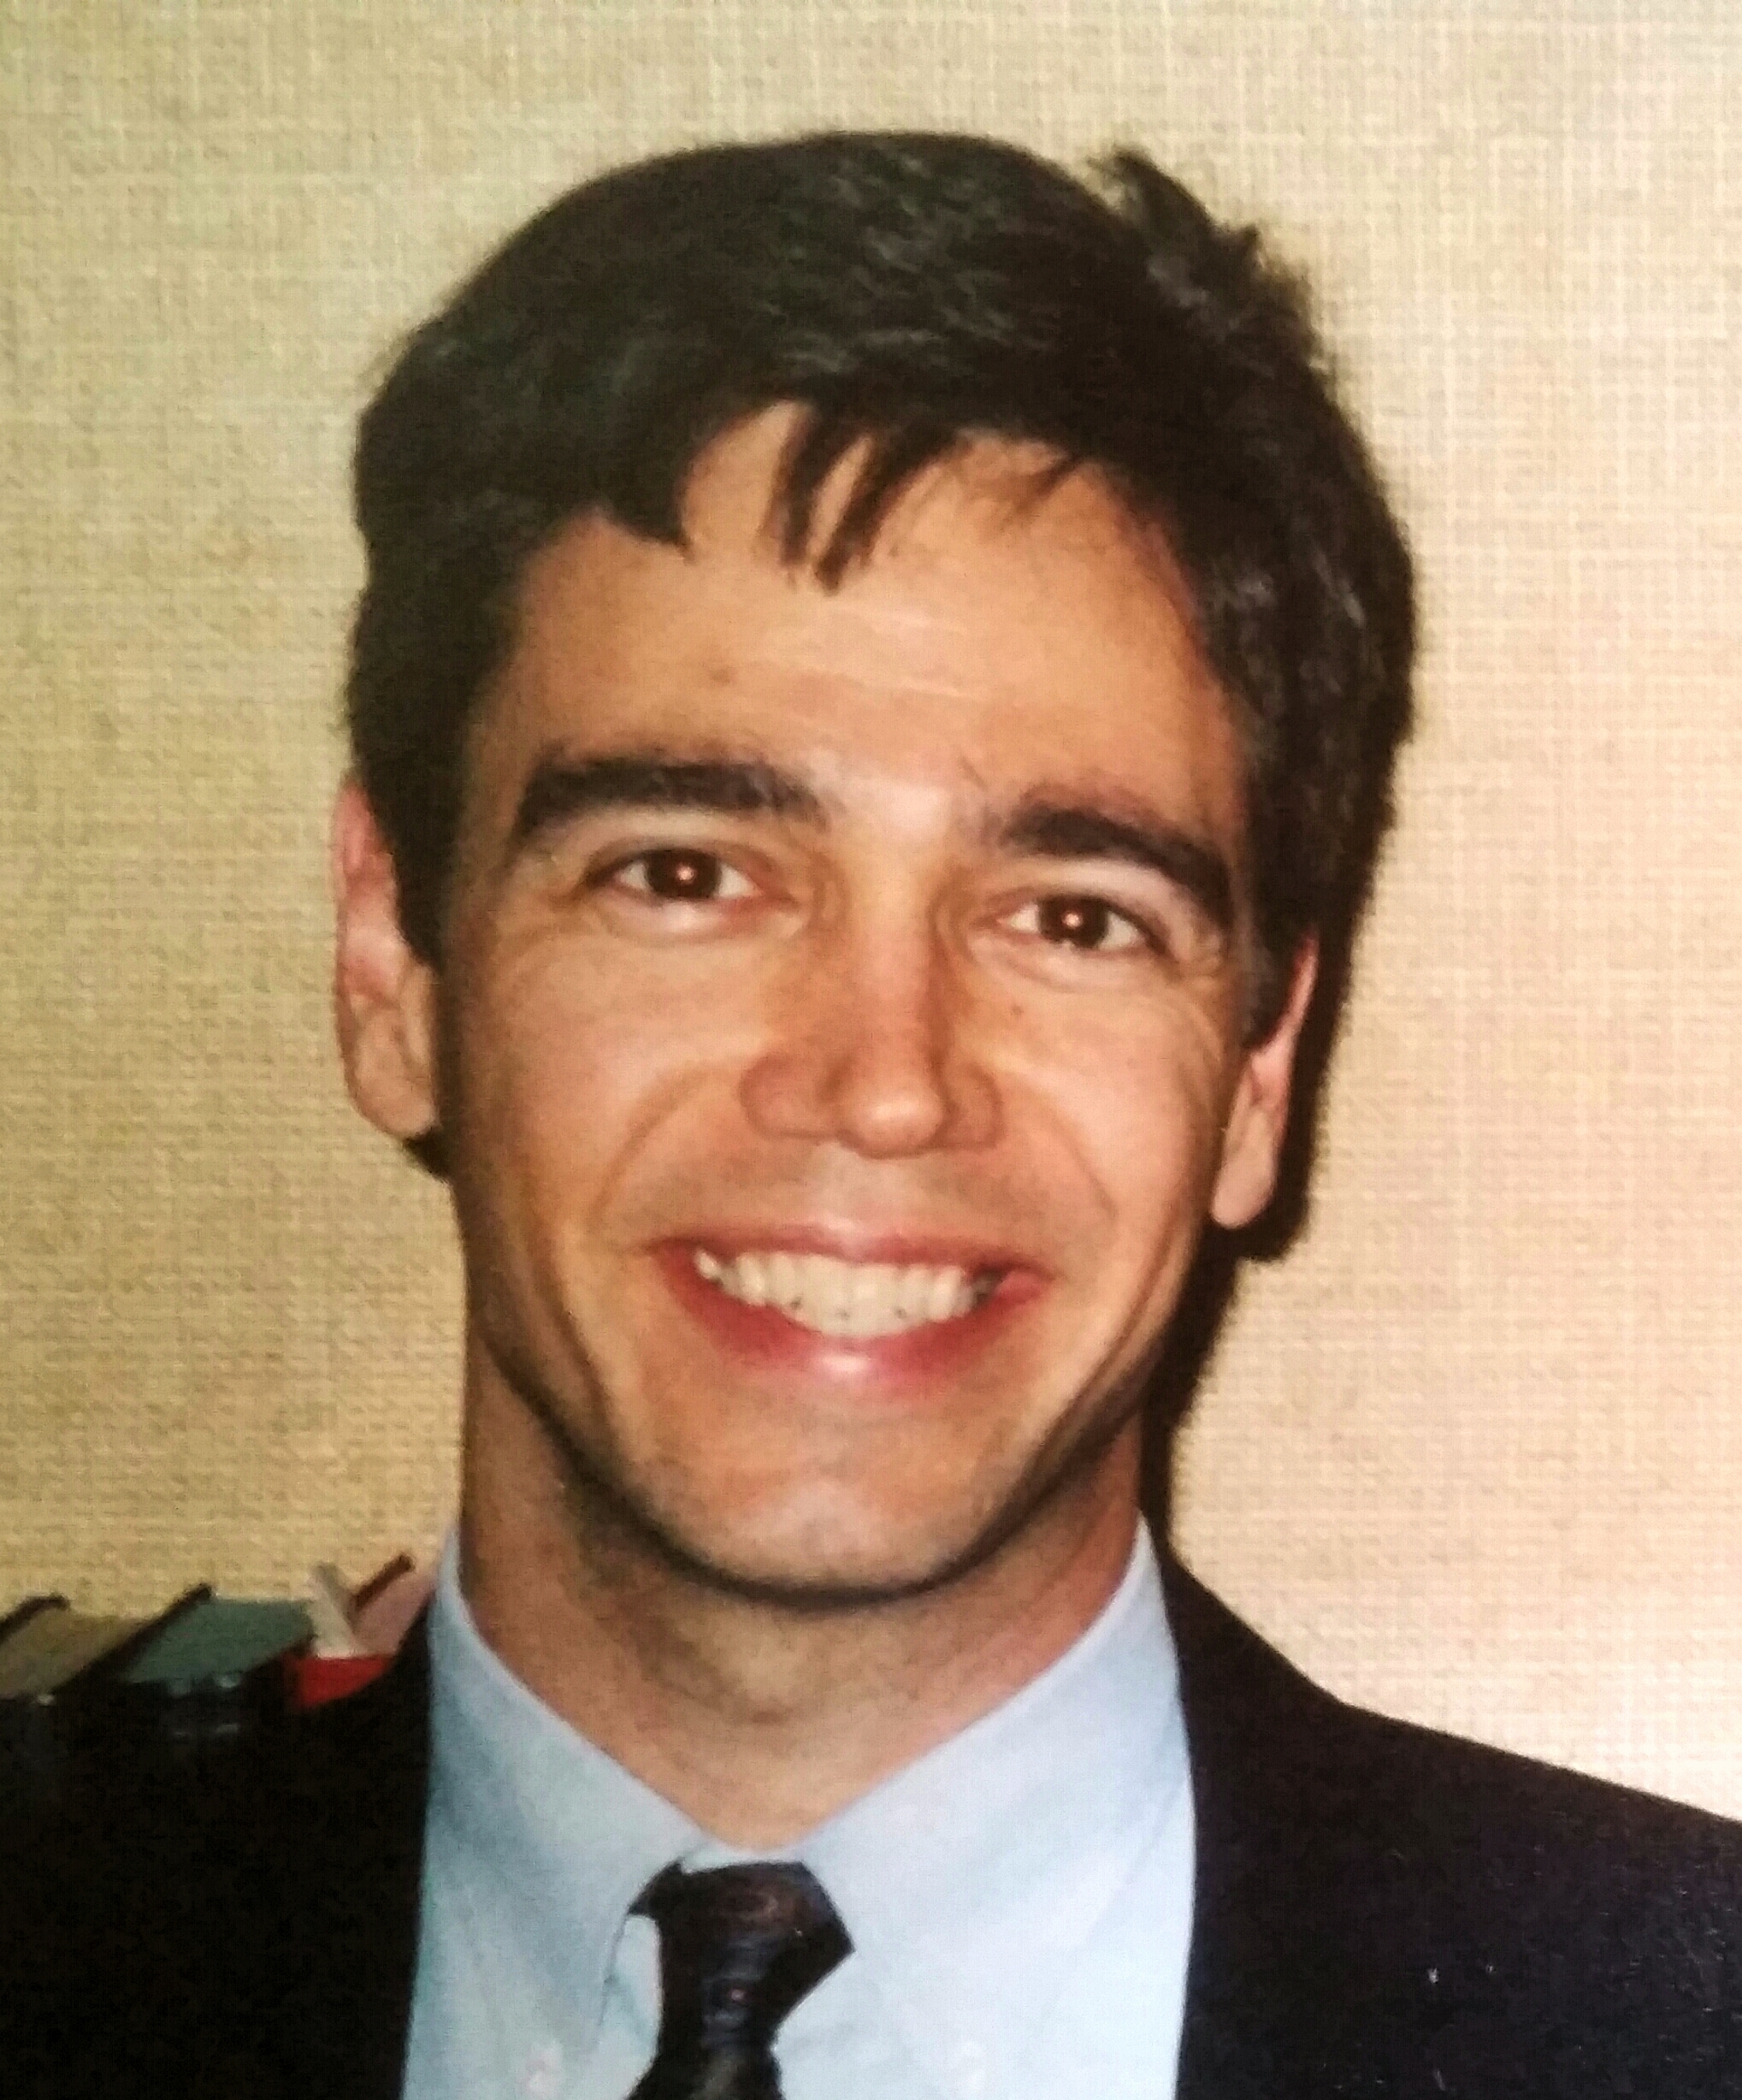 Brian James Thomas